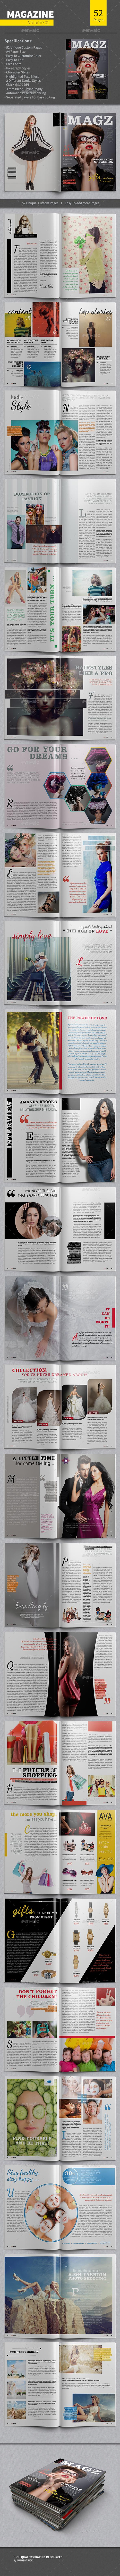 Magazine Template - Volume 02 - Magazines Print Templates